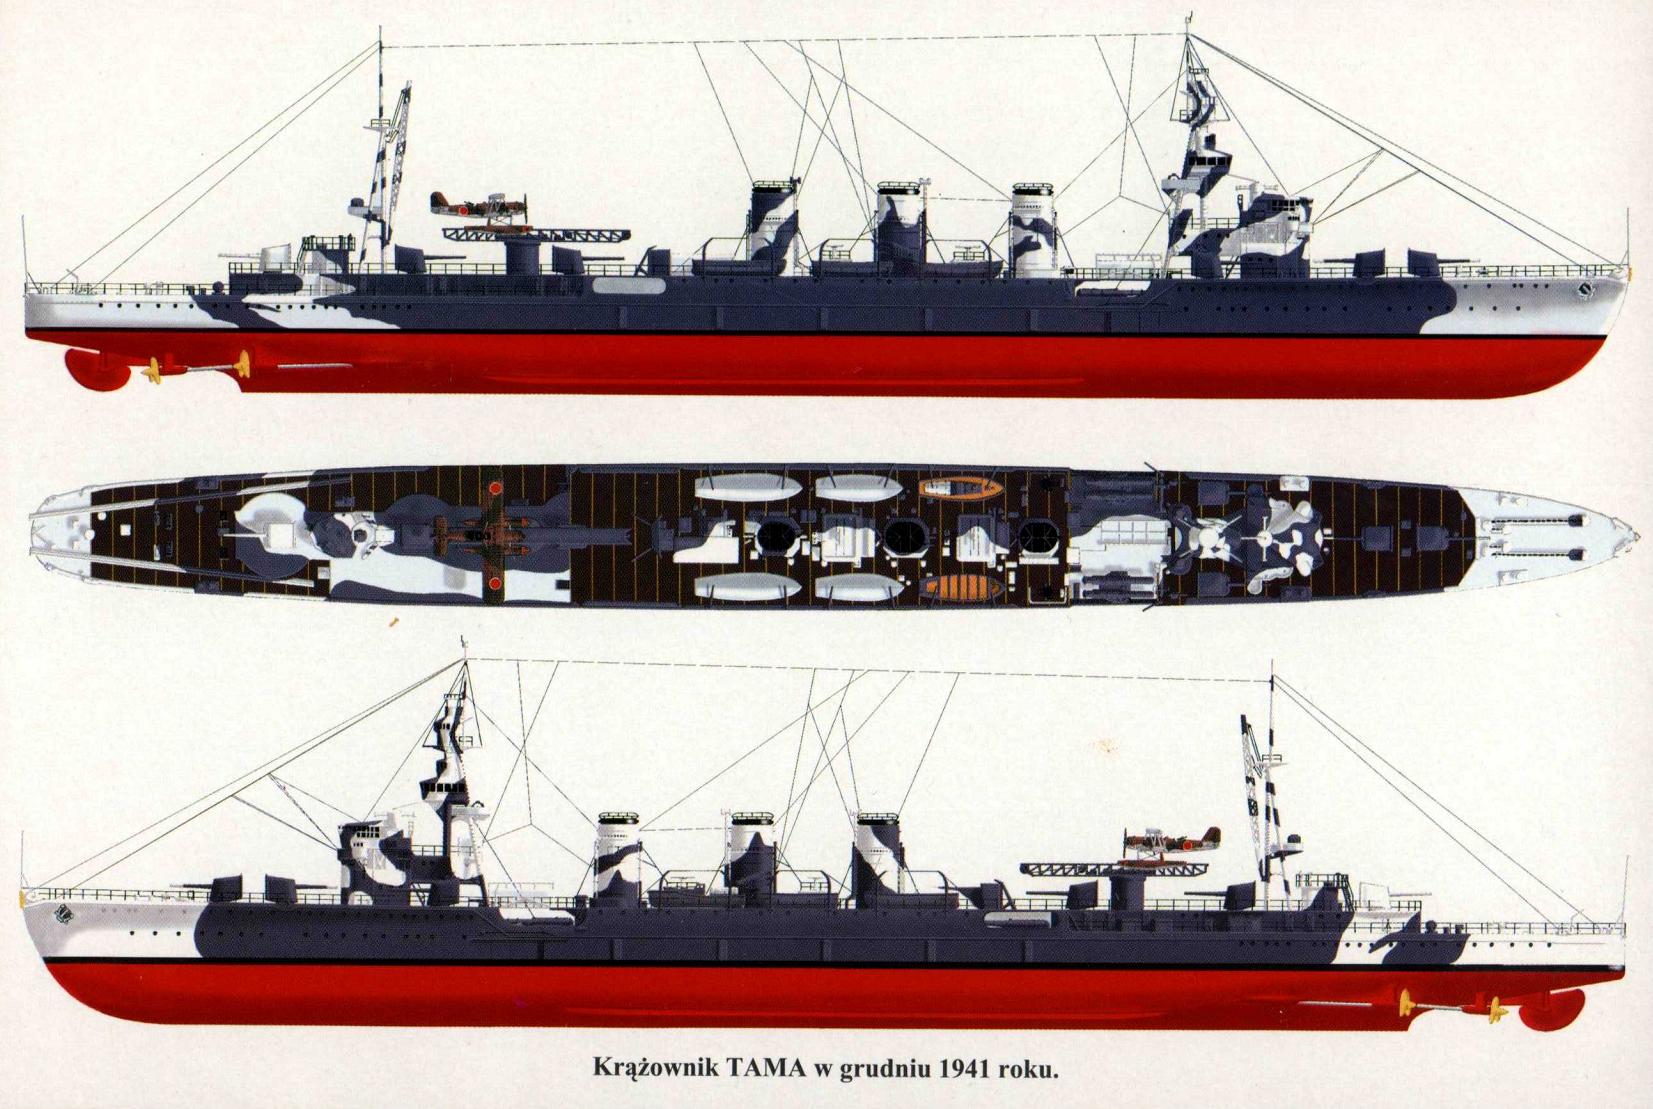 ijn cl tama warships diagram 176 navy ships imperial. Black Bedroom Furniture Sets. Home Design Ideas